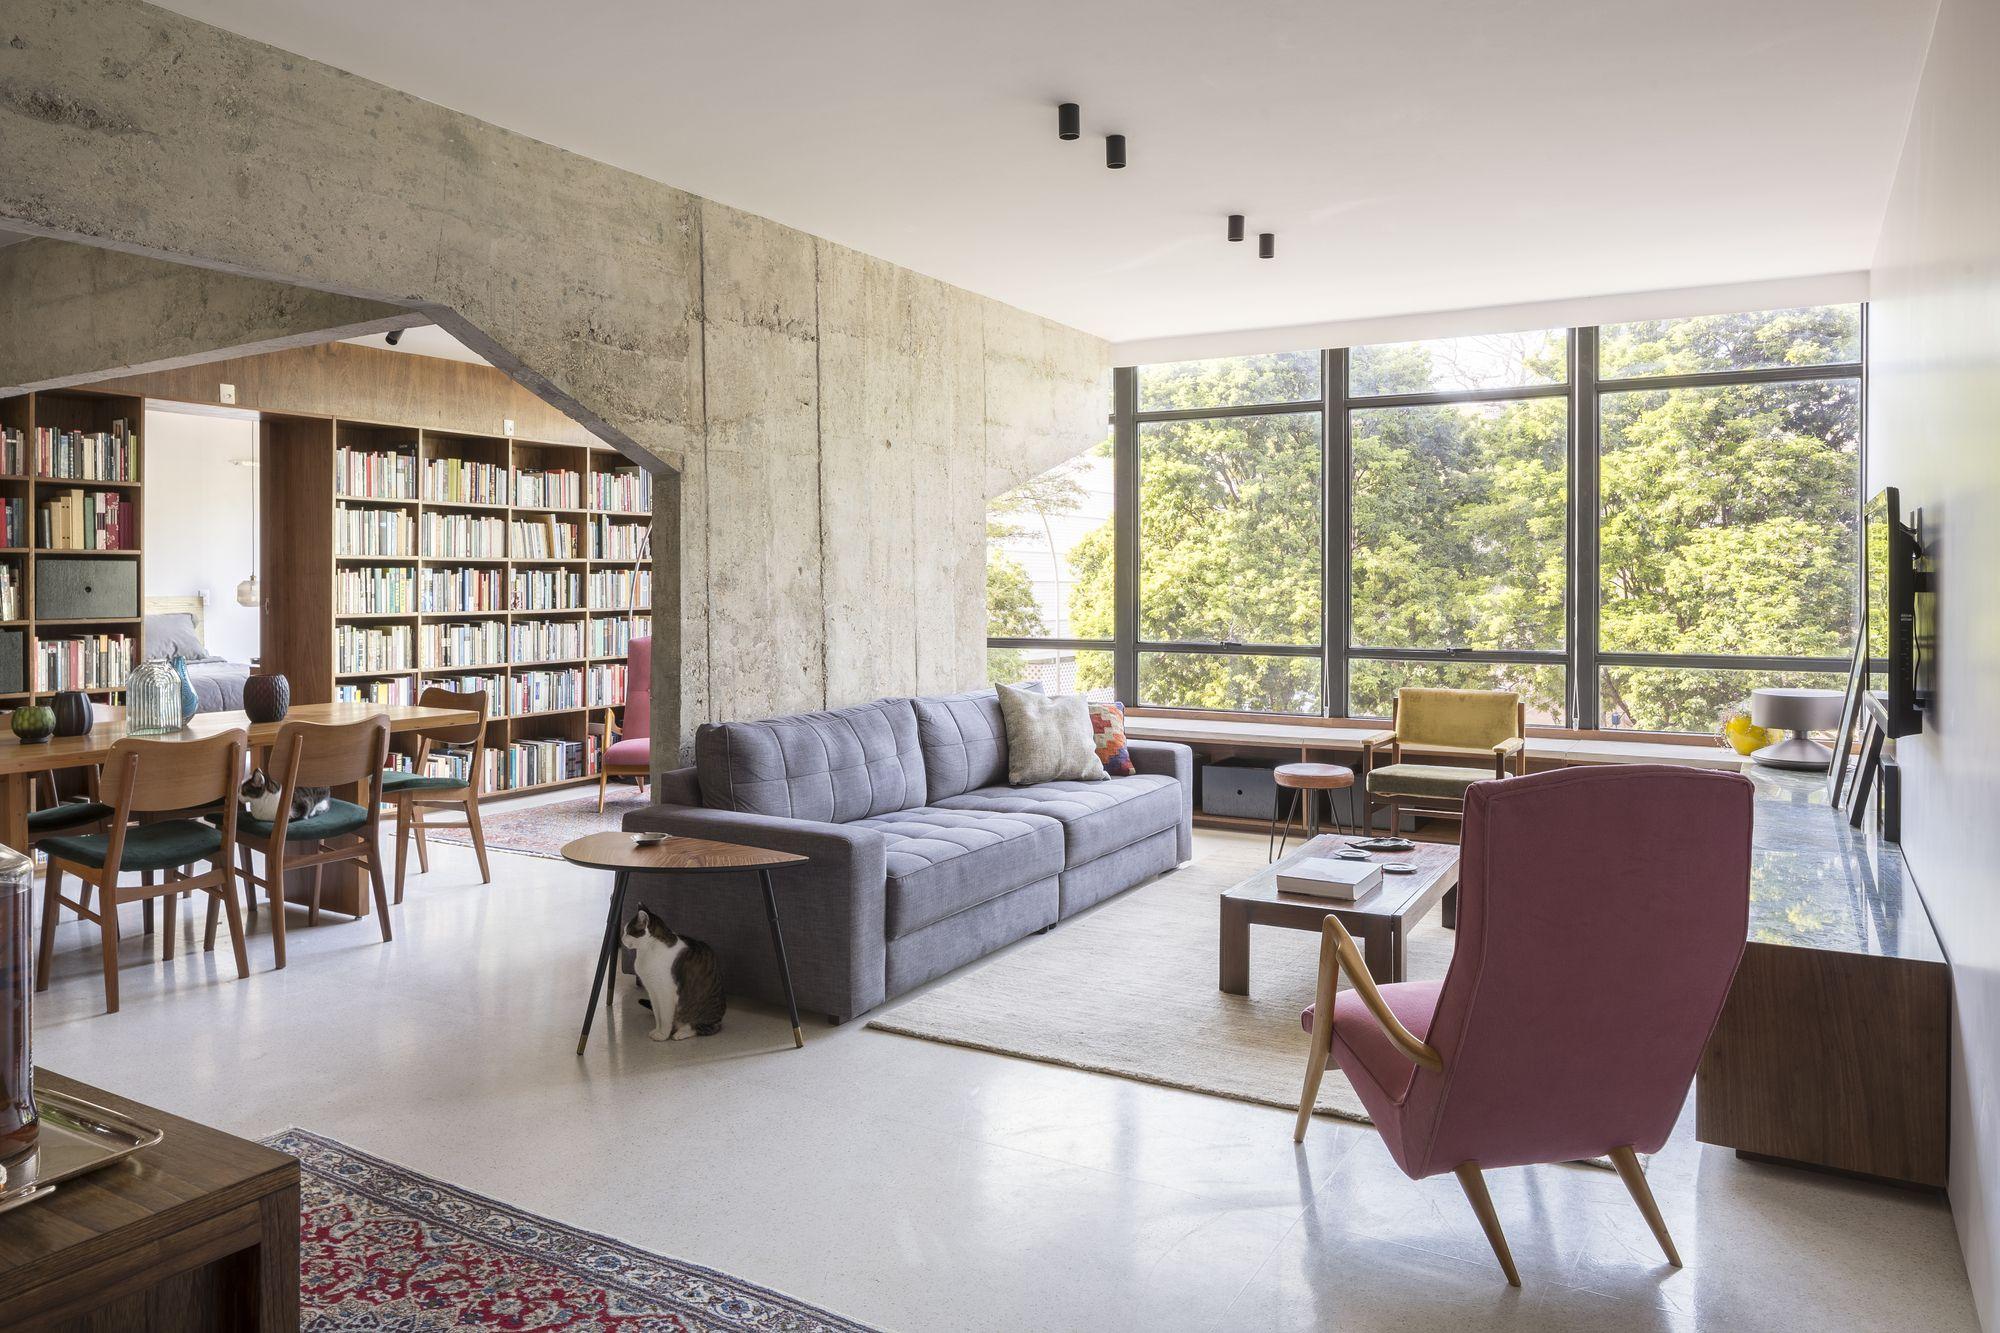 Apartment 3 Zero 8 | Debaixo do Bloco Arquitetura